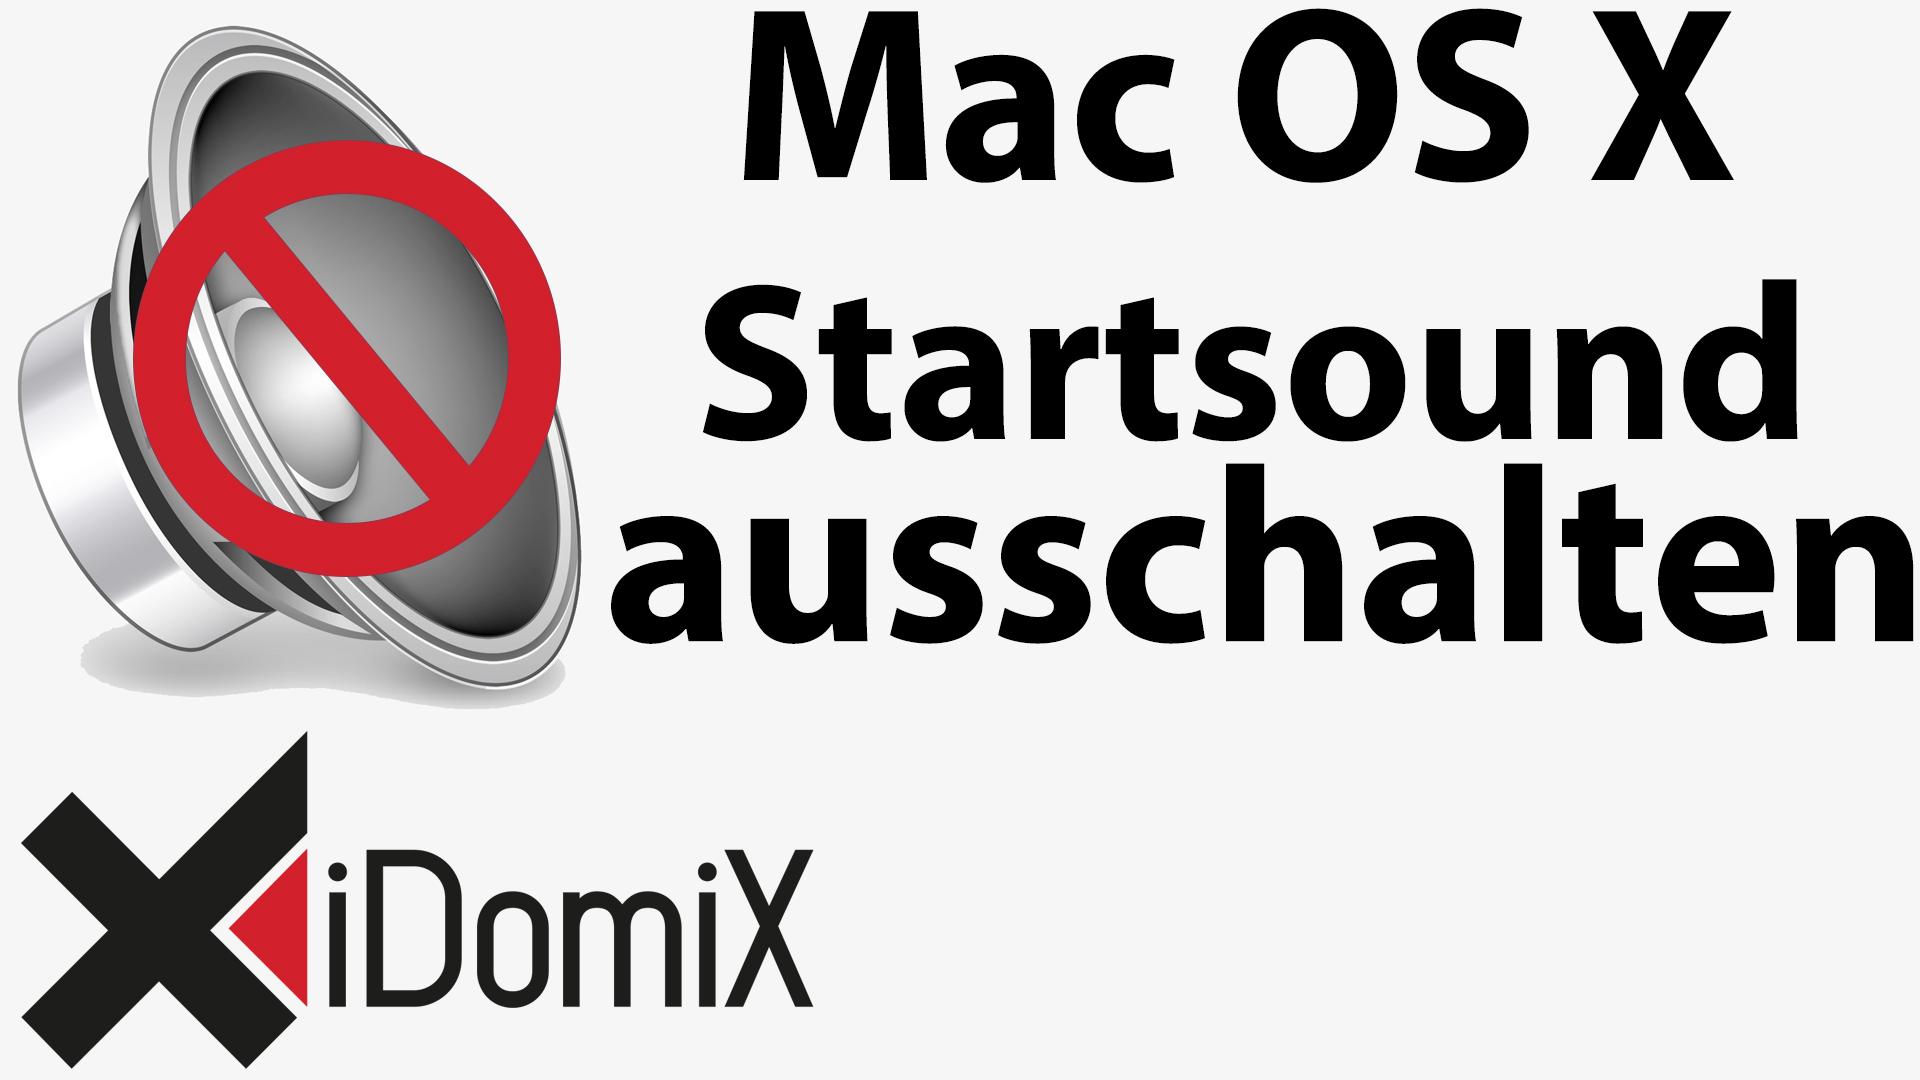 #201 Mac OS X Startsound ausschalten